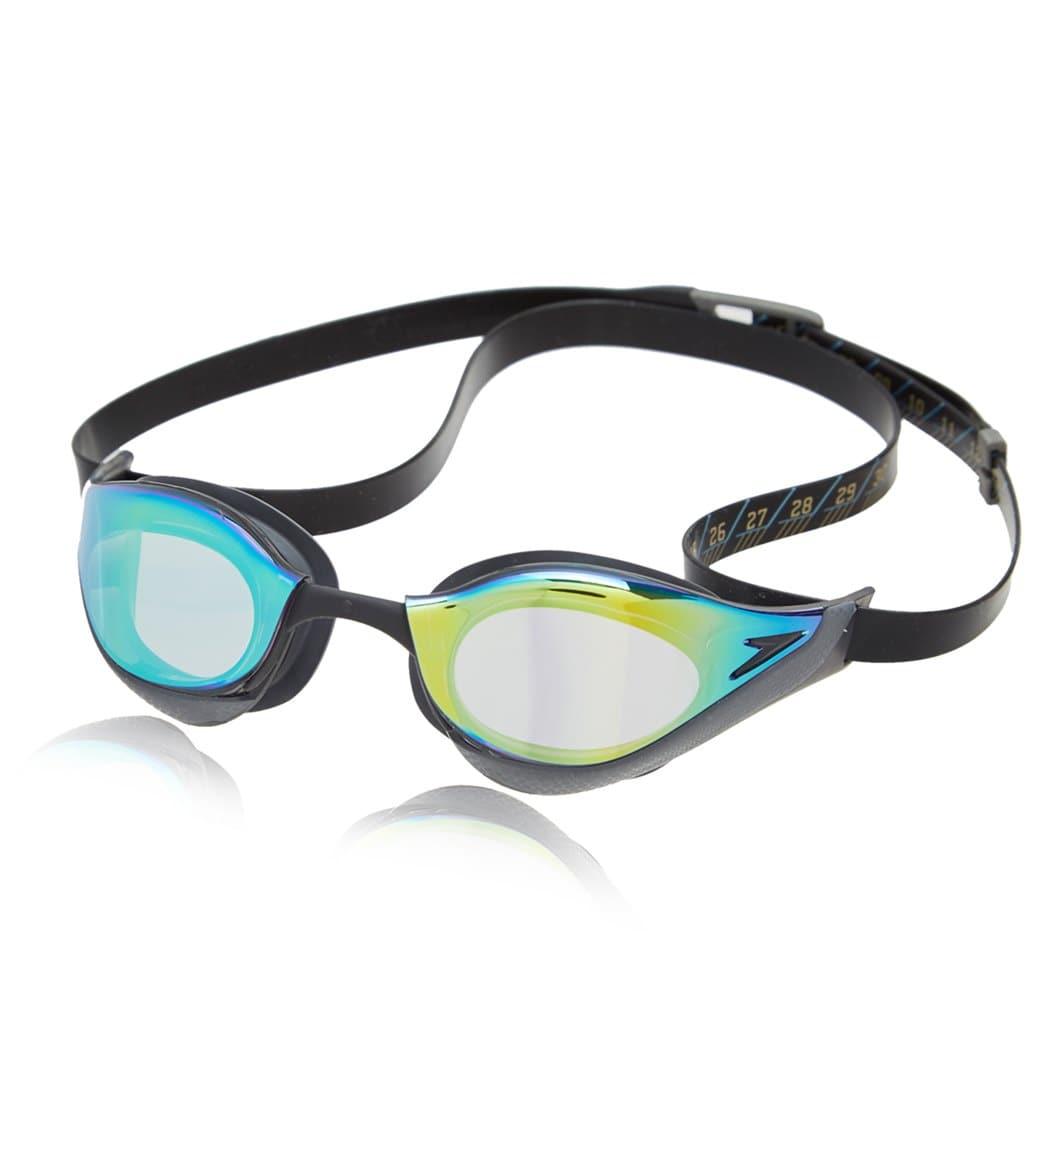 Speedo Fastskin Pure Focus Mirrored Goggle